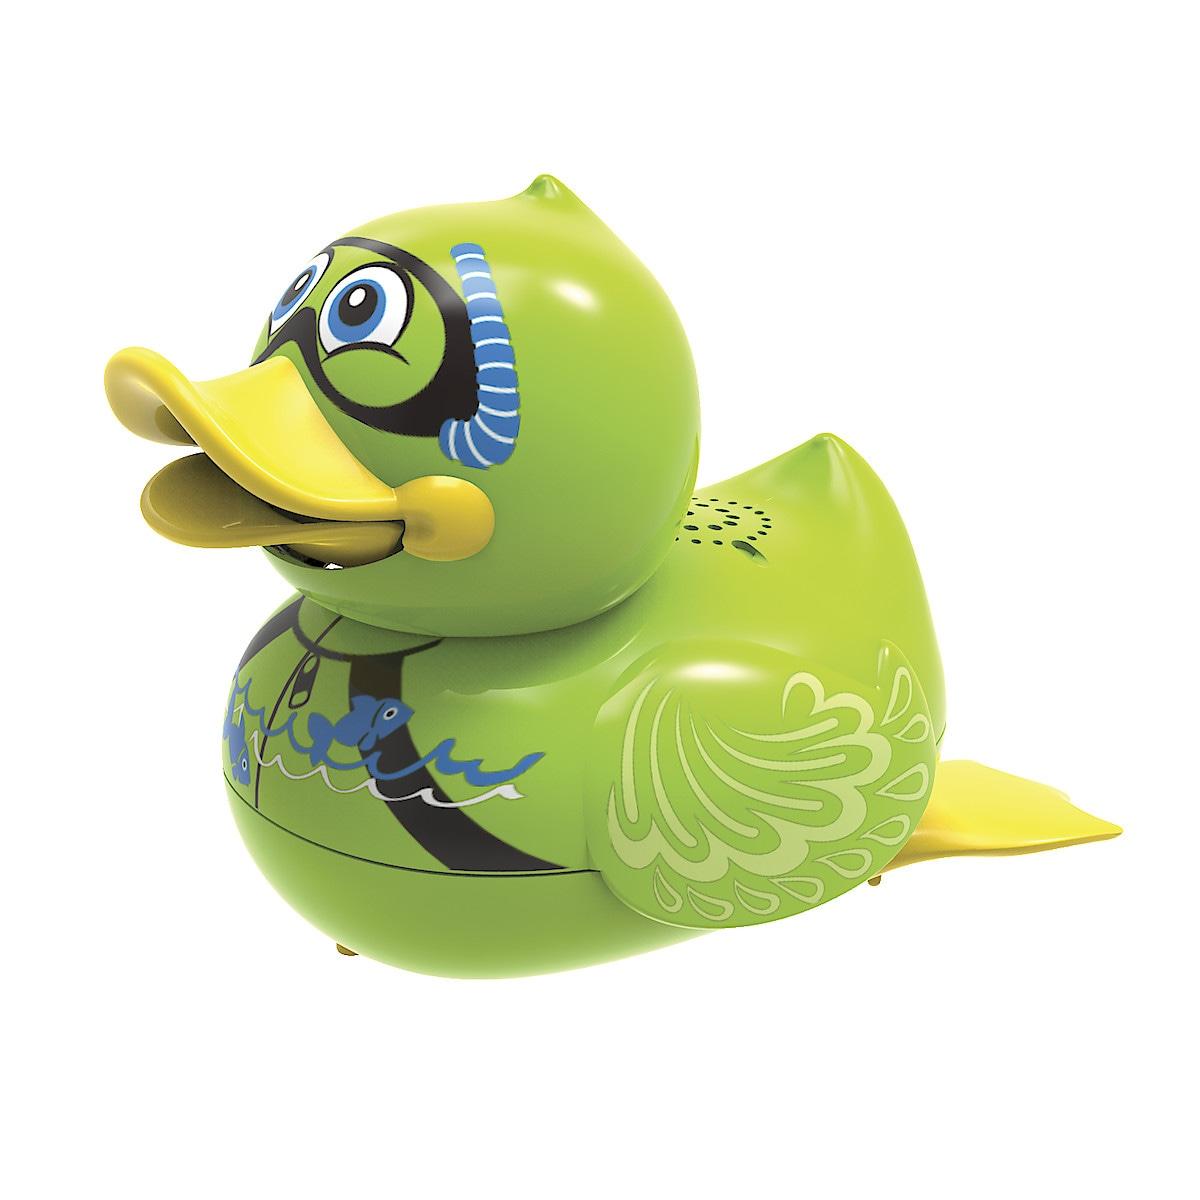 Uiva ankka Silverlit Aqua Duck